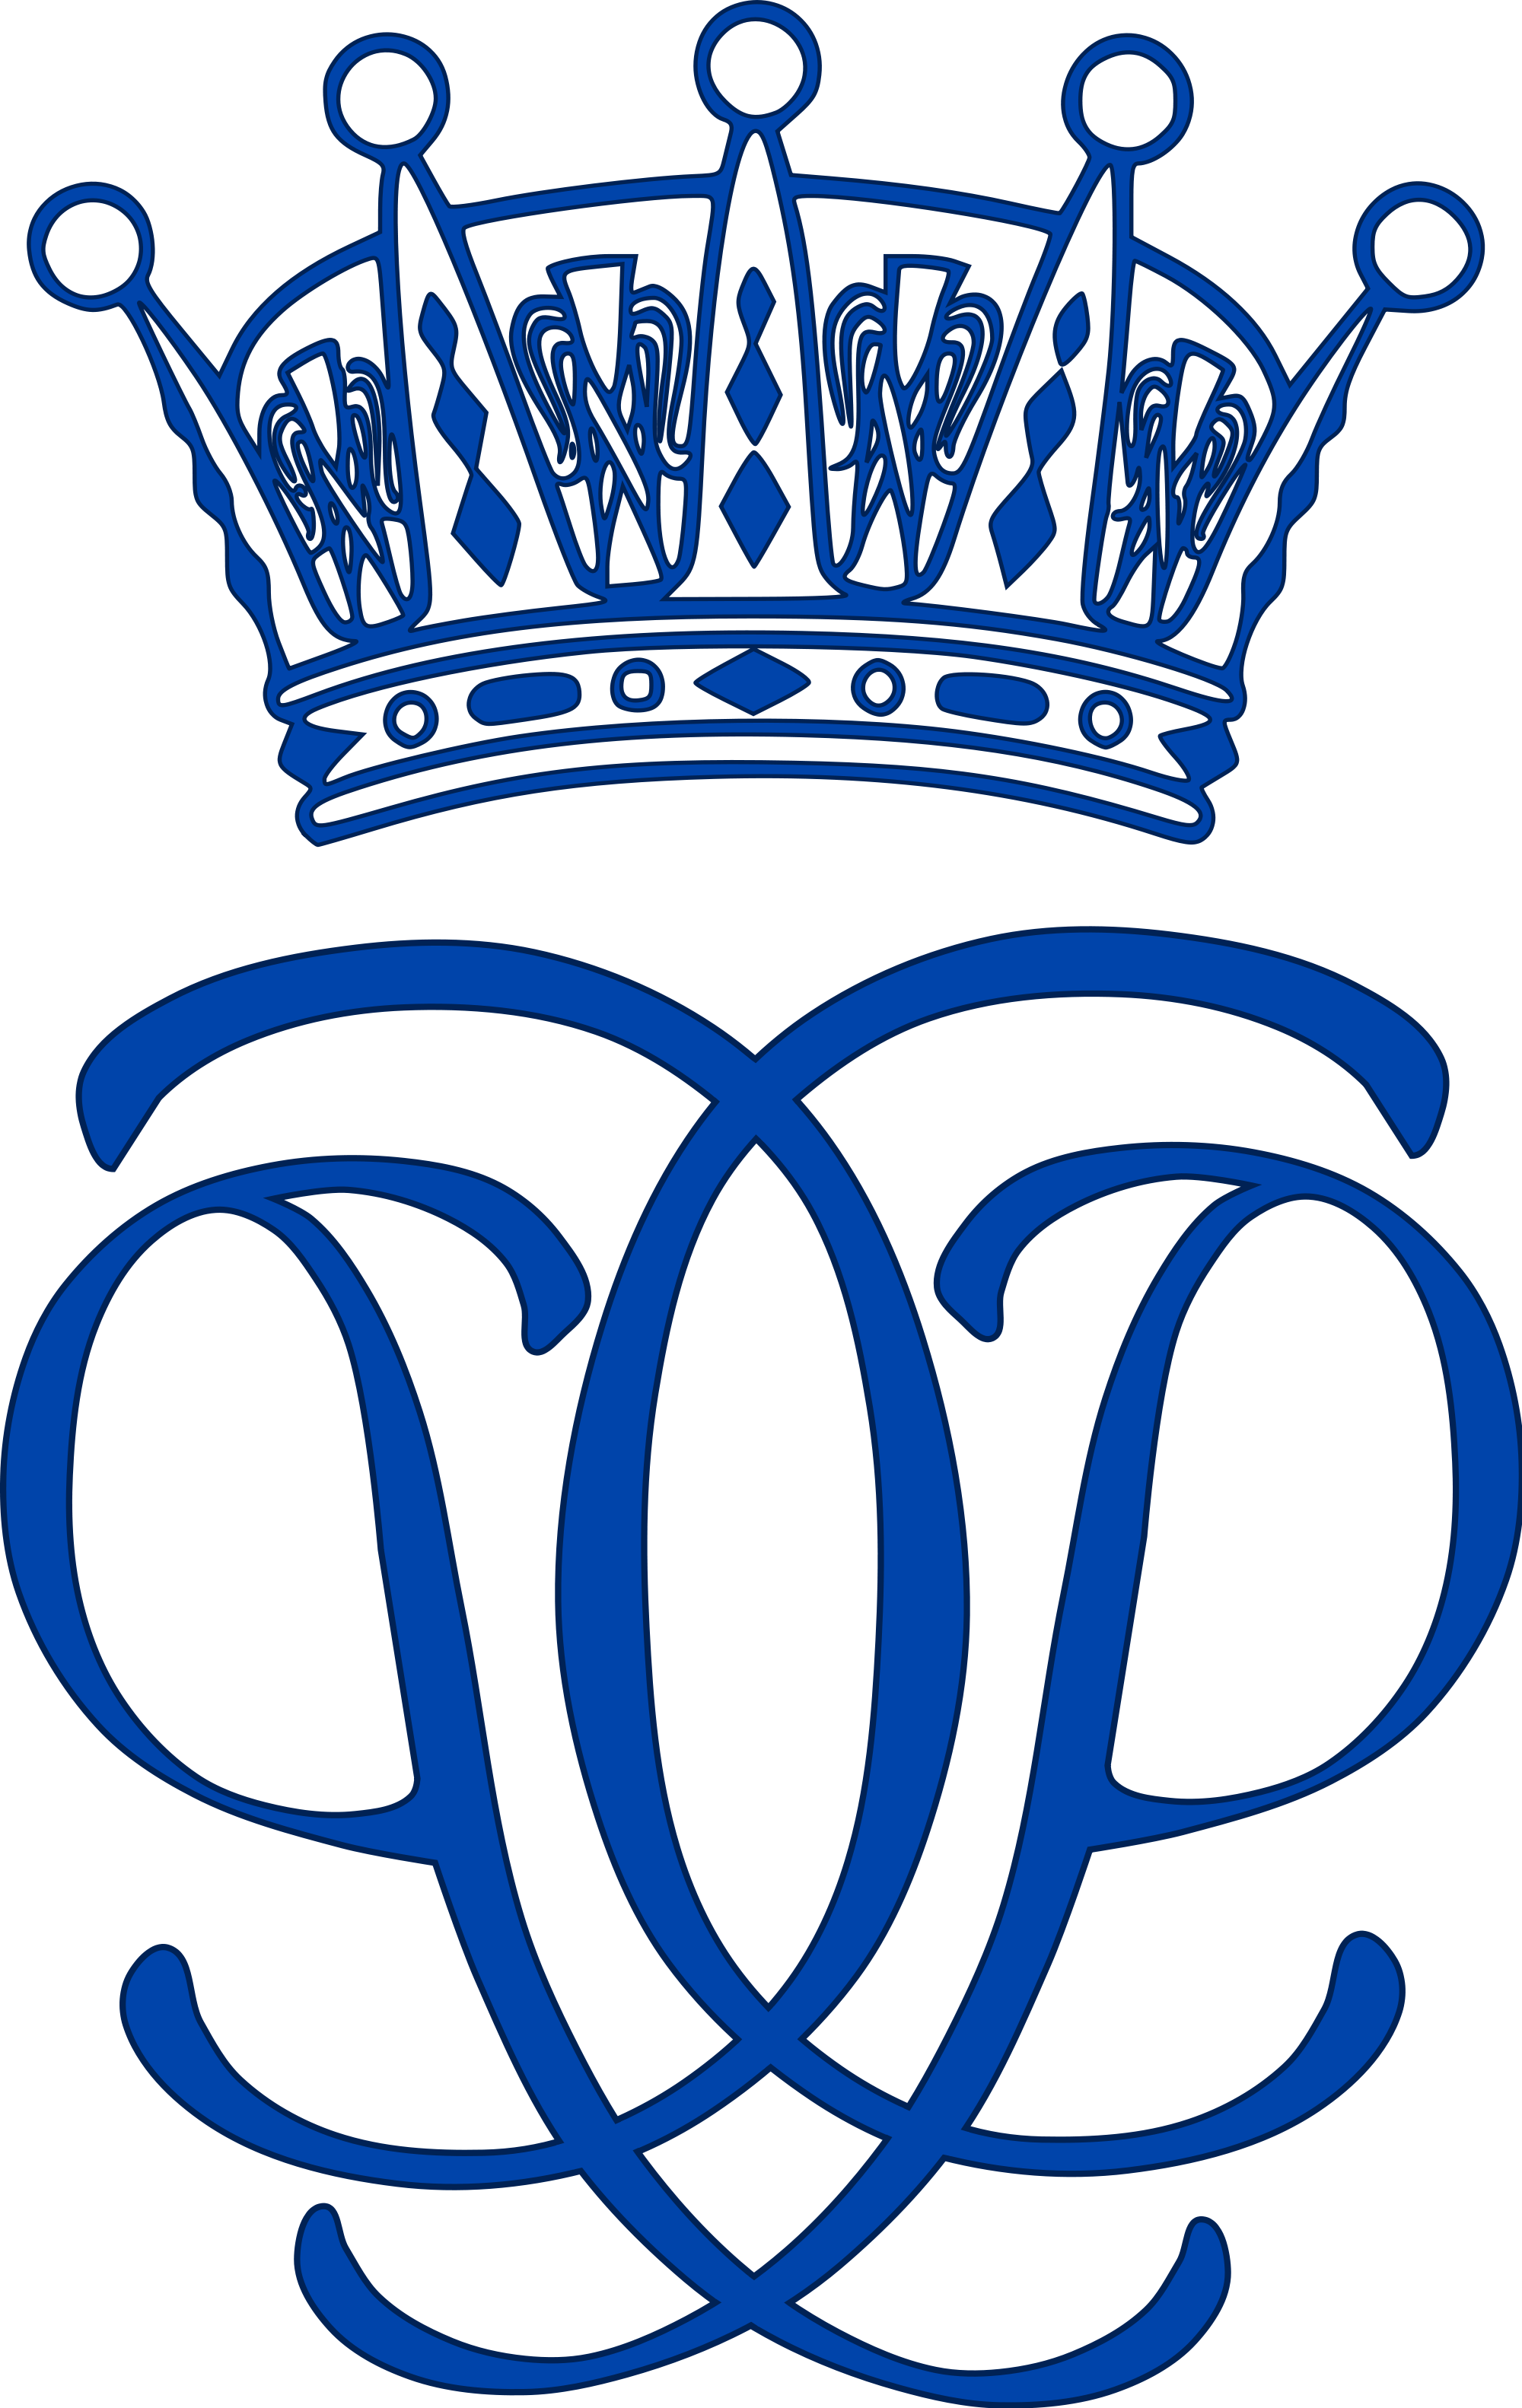 Crown monogram clipart clip stock monogram królewski szwedzkiego księcia Värmland Karola Filipa ... clip stock